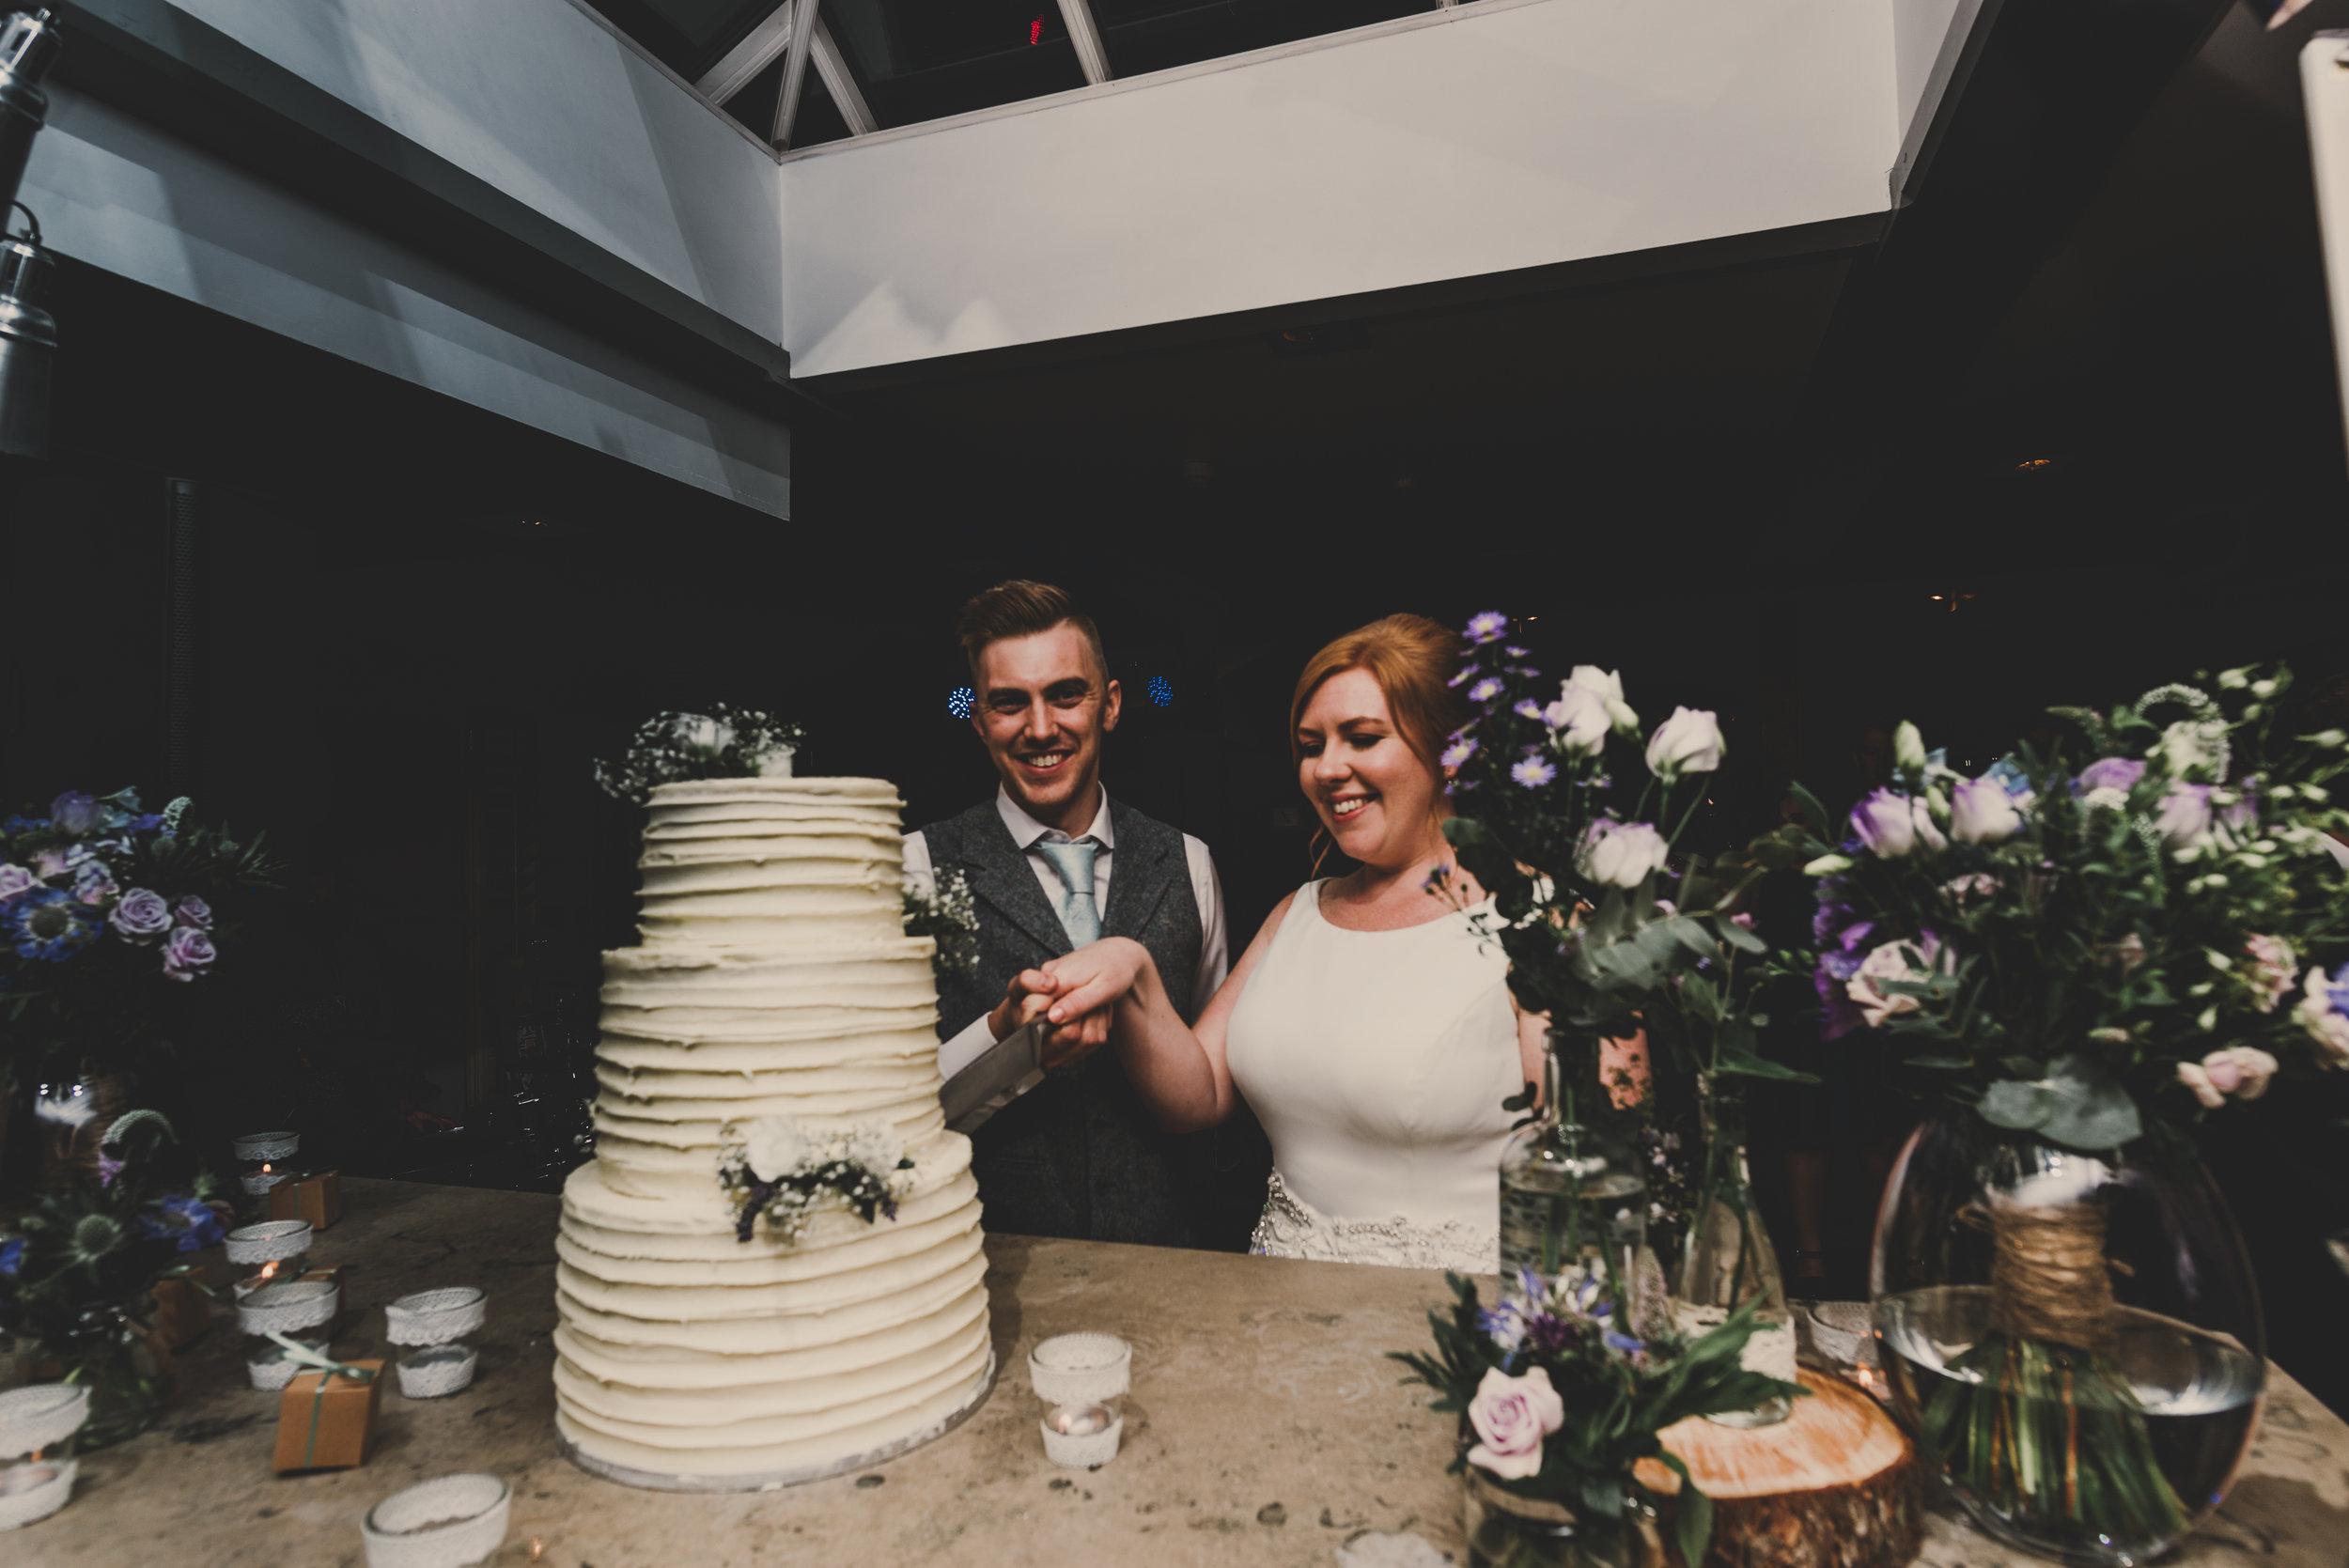 cheshire-alternative-wedding-photography-in-anglesey (19).jpg